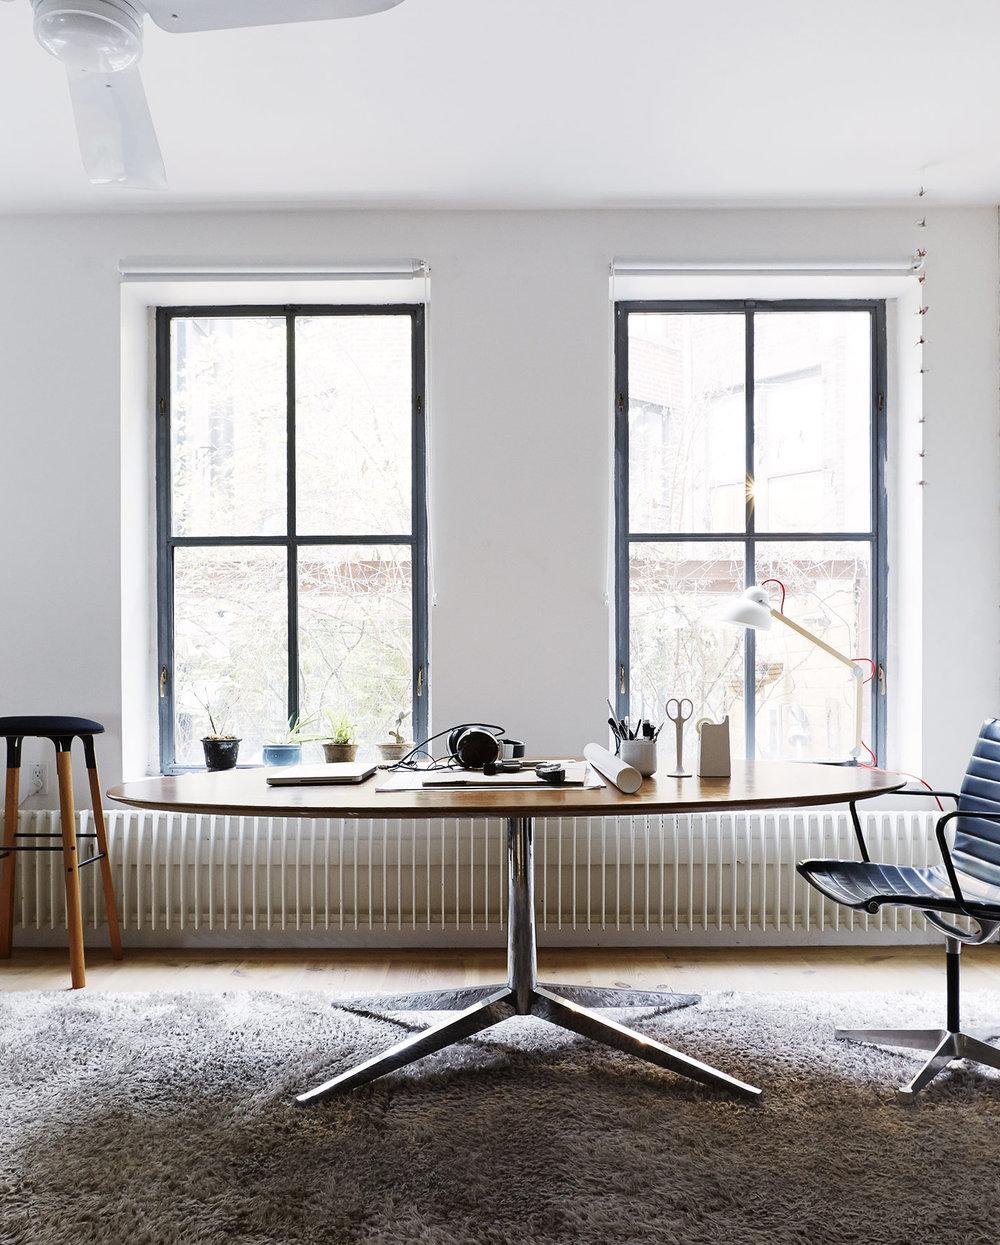 HARRISON STREET - Interior/Residential